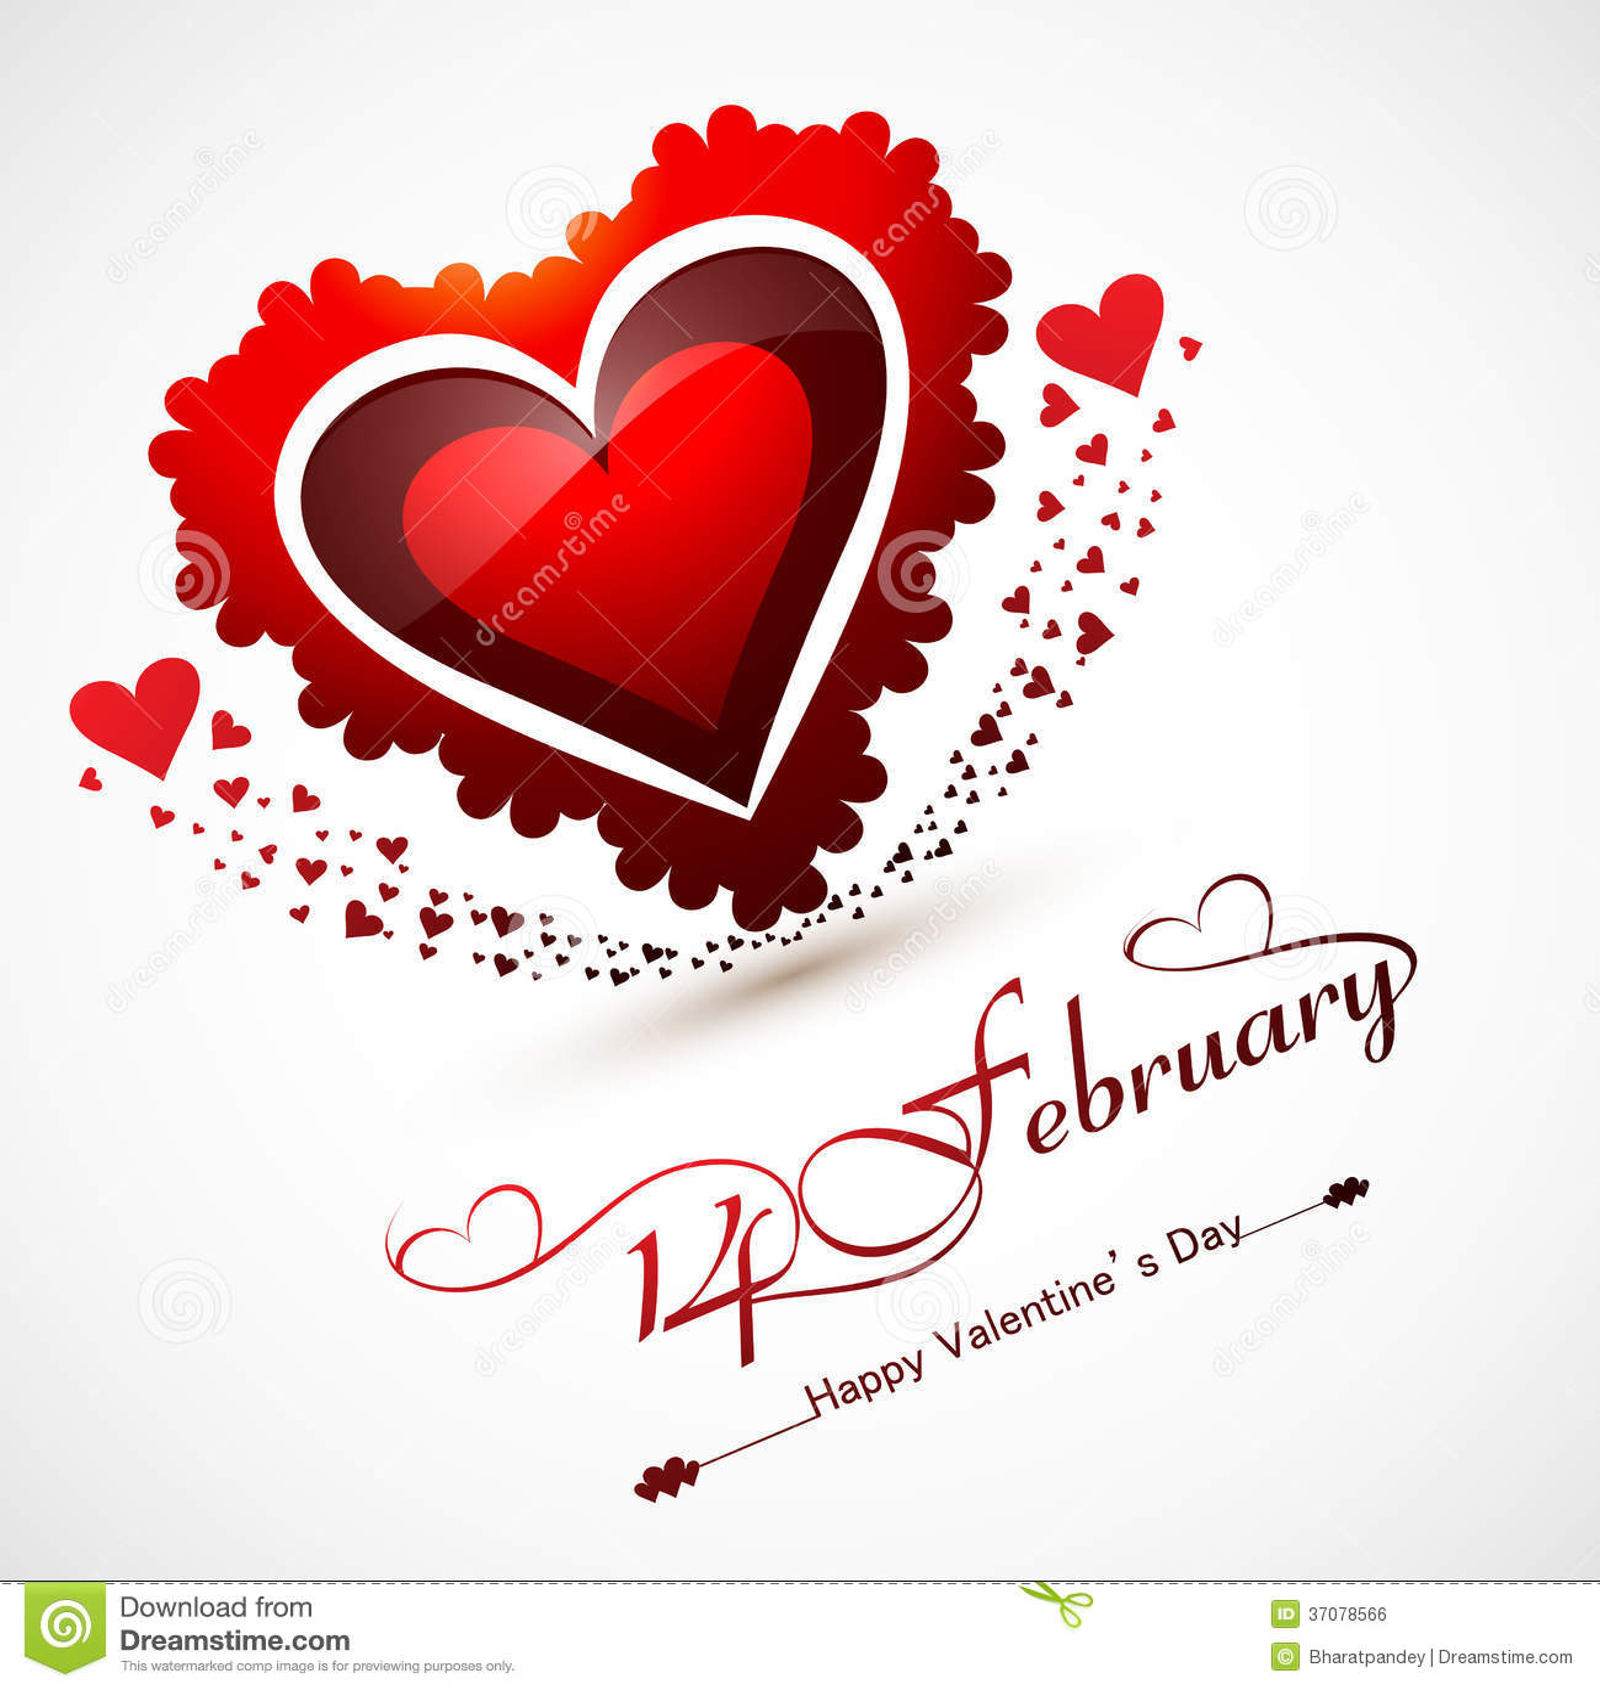 valentines day wedding invitations - Kubre.euforic.co